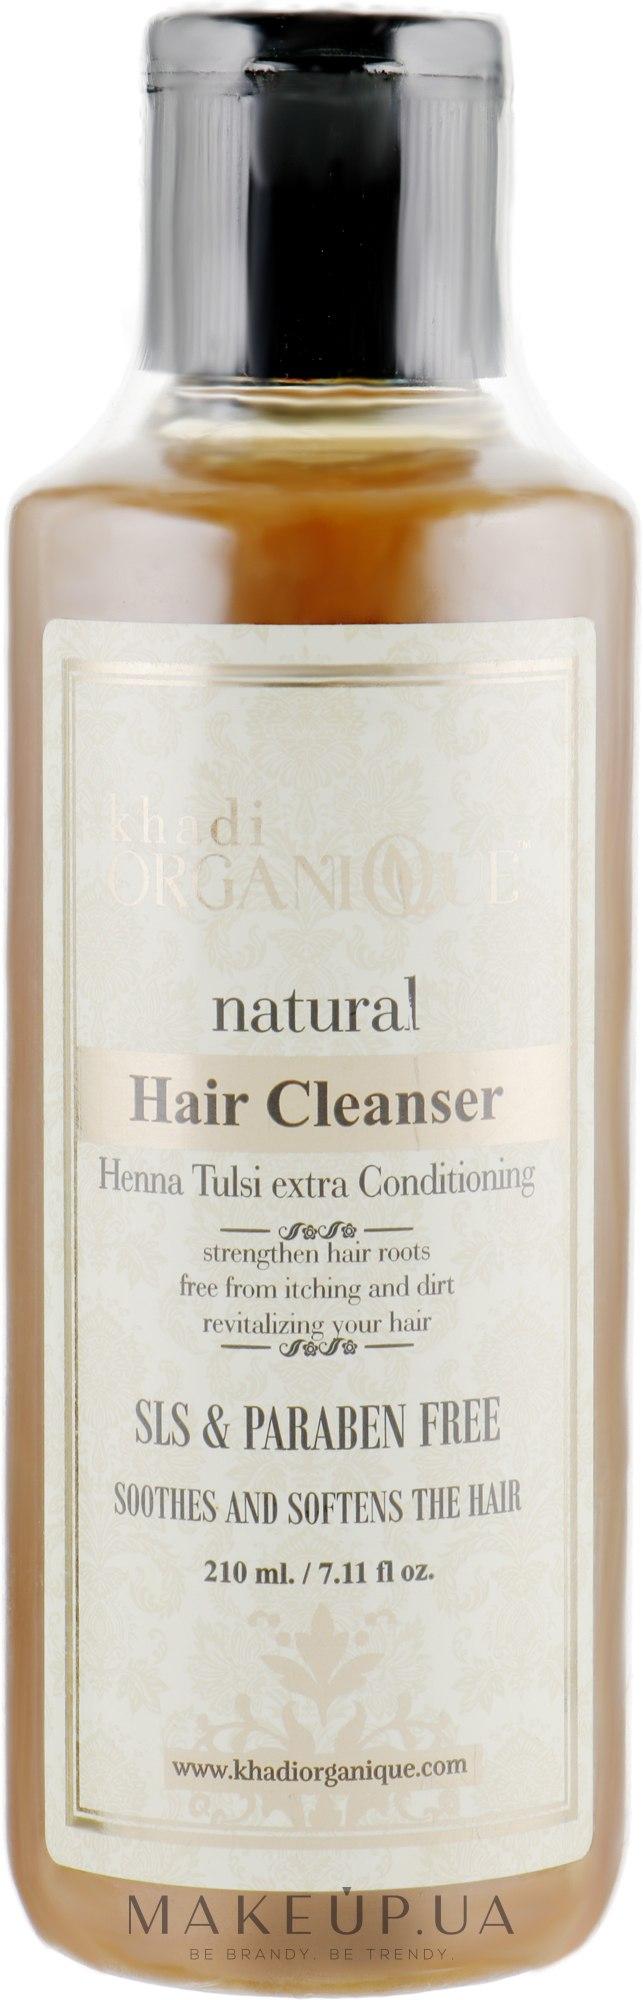 "Натуральный безсульфатный шампунь ""Хна и Туласи"" - Khadi Organique Henna Tulsi Extra Shampoo Hair Cleanser SLS & Paraben Free — фото 210ml"